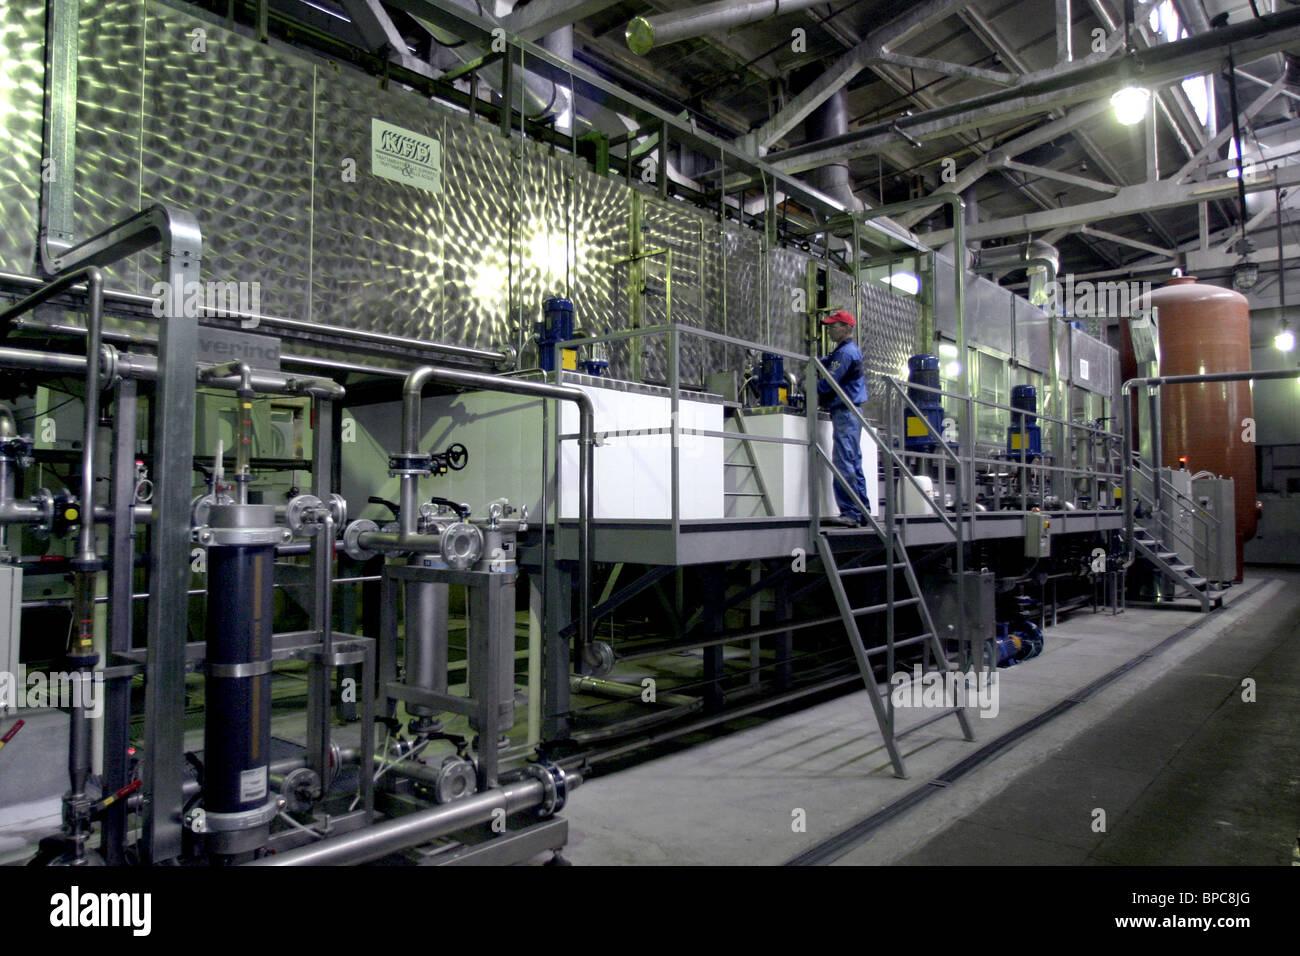 Candy washing machines manufactured in Kirov - Stock Image